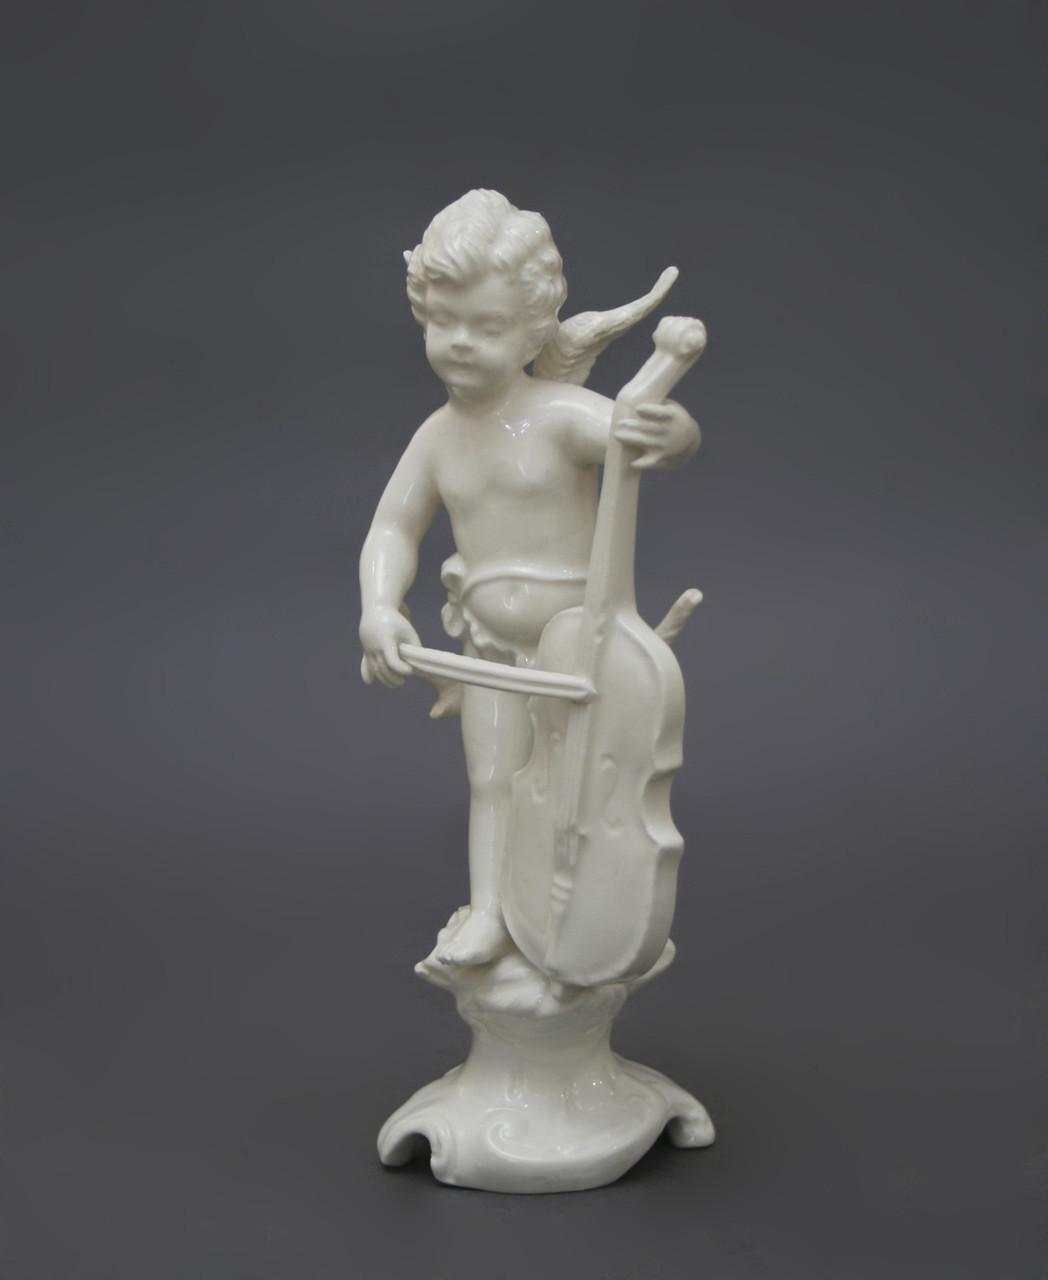 Статуэтка Ангел. Керамика, ручная работа, Италия